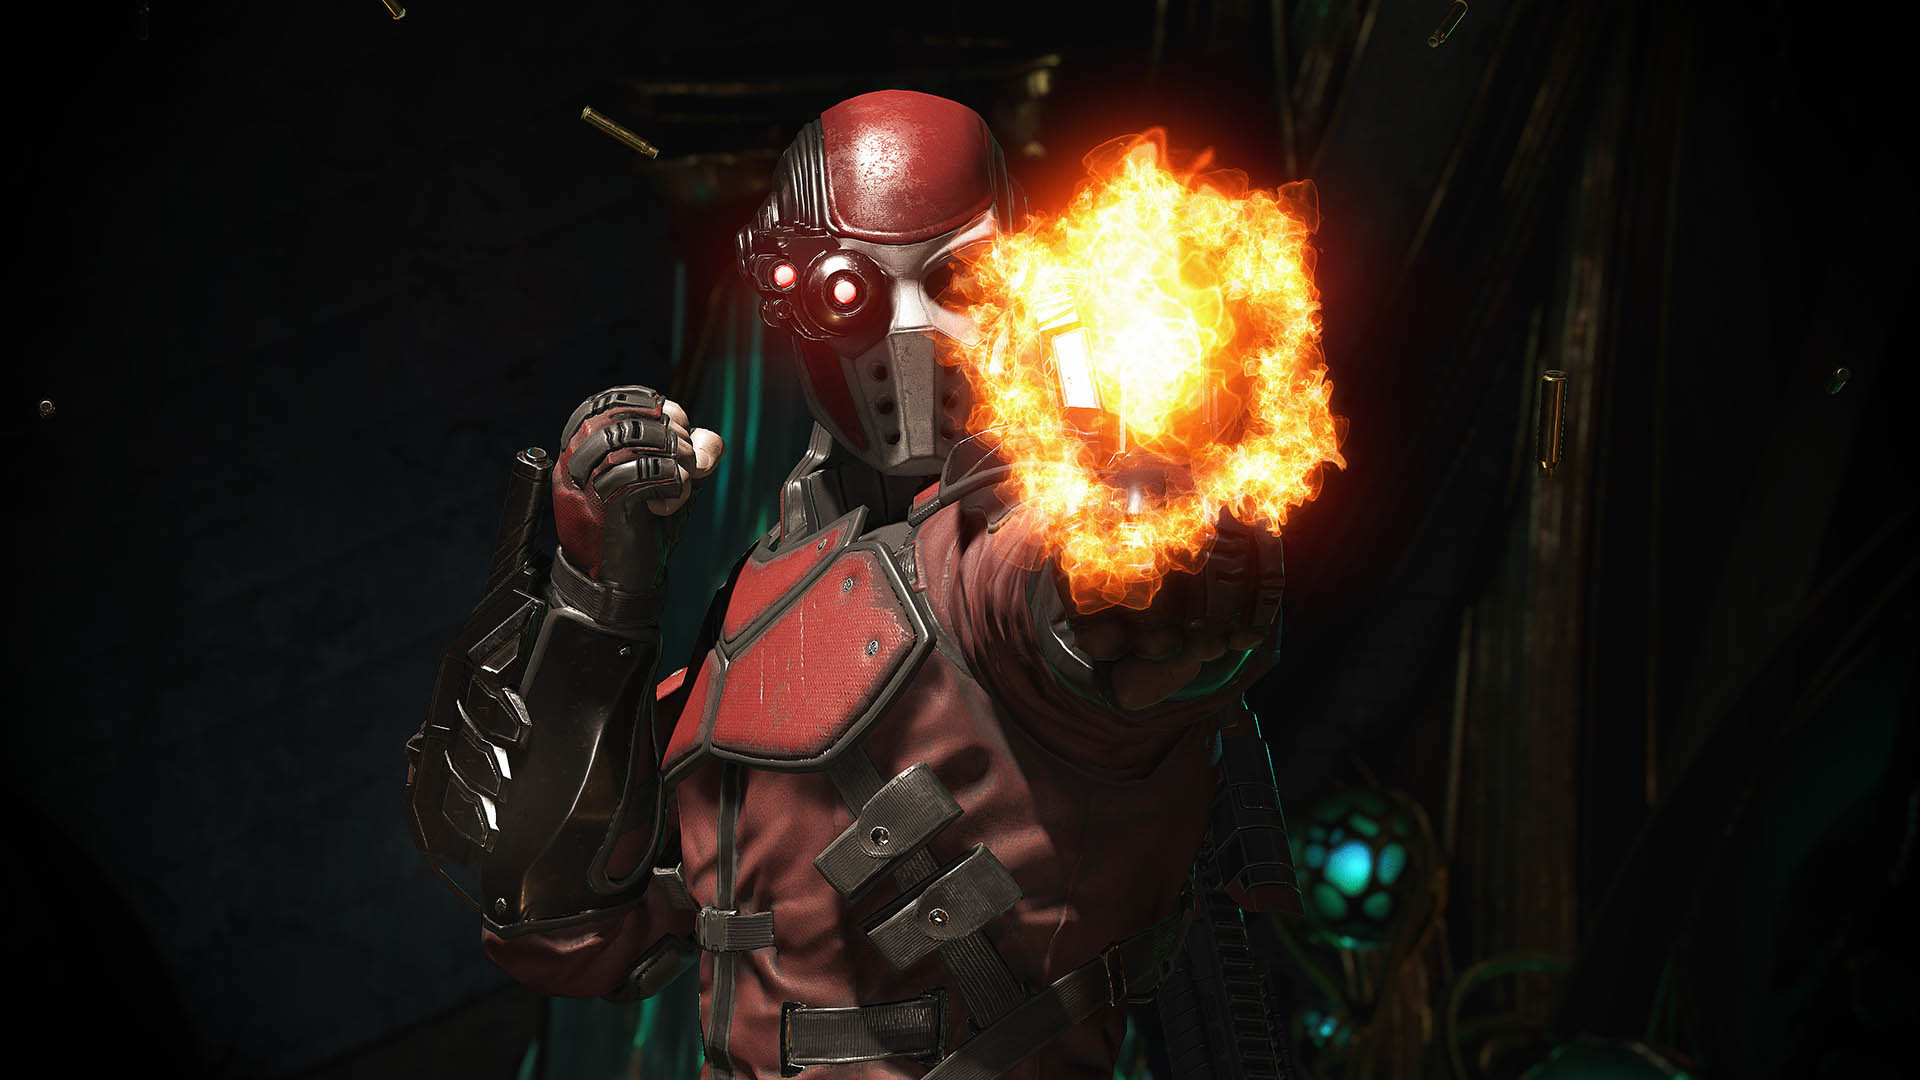 A-Injustice 2 inc Darkseid DLC – PS4